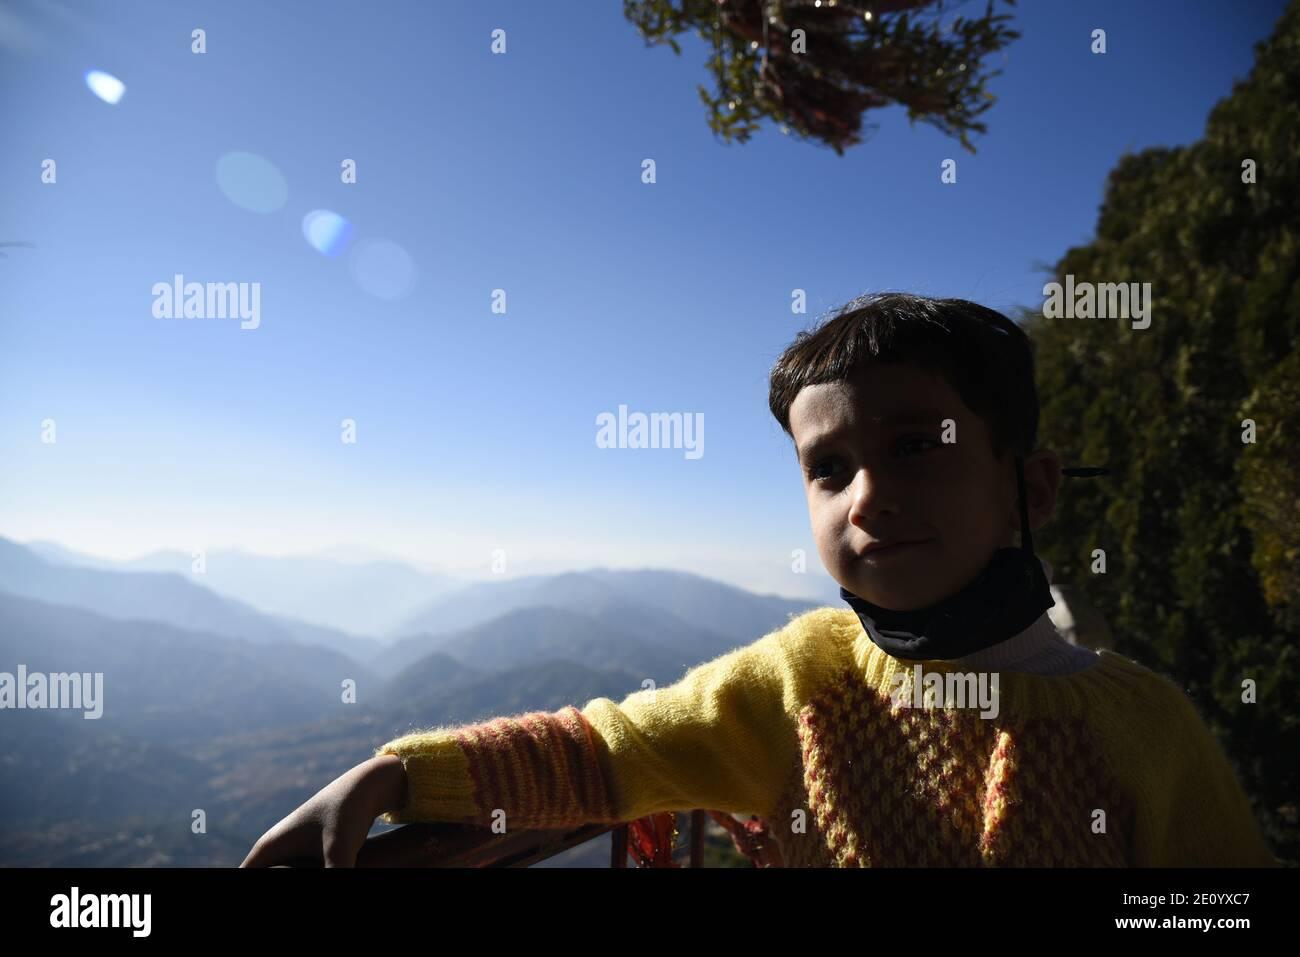 Neve panoramica Himalaya montagna vista da Hindu Lord Shiva Mukteshwar Tempio situato nel distretto Nainital Uttarakhand stato. Foto Stock